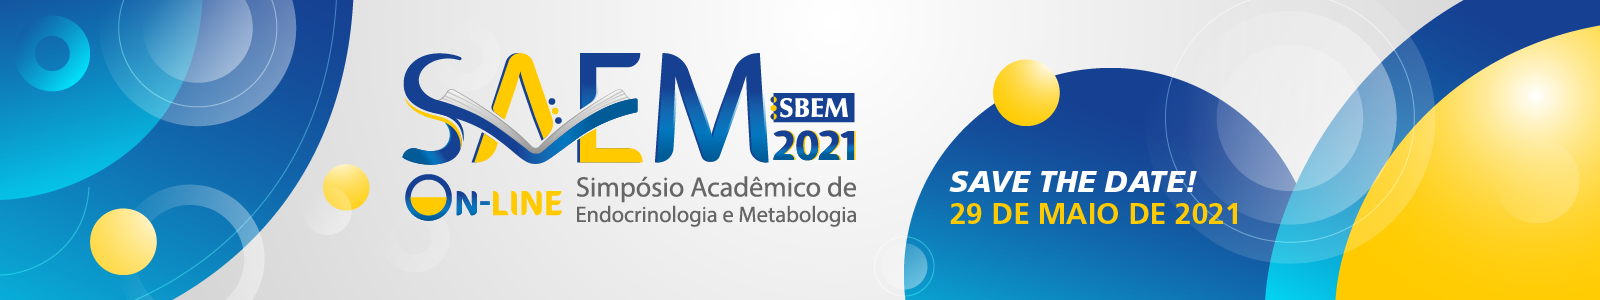 SAEM-site-banner 1 2